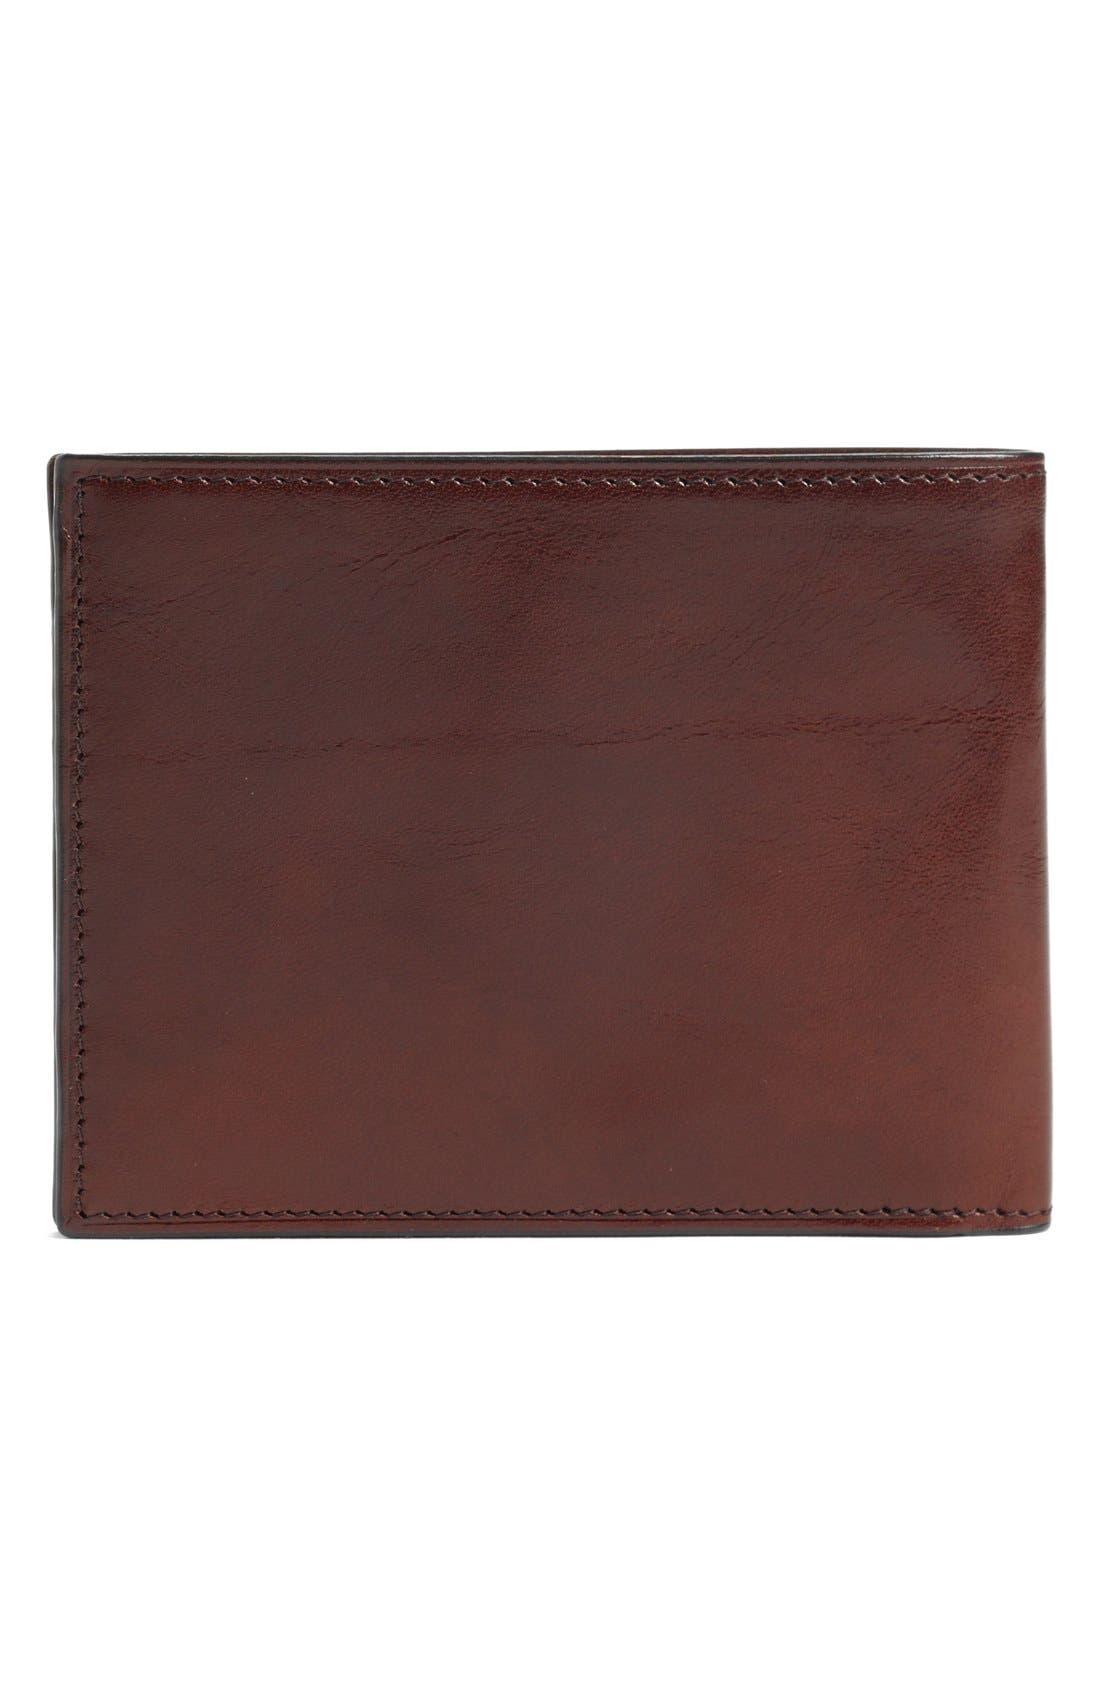 Alternate Image 3  - Bosca 'Old Leather' L-Fold Wallet